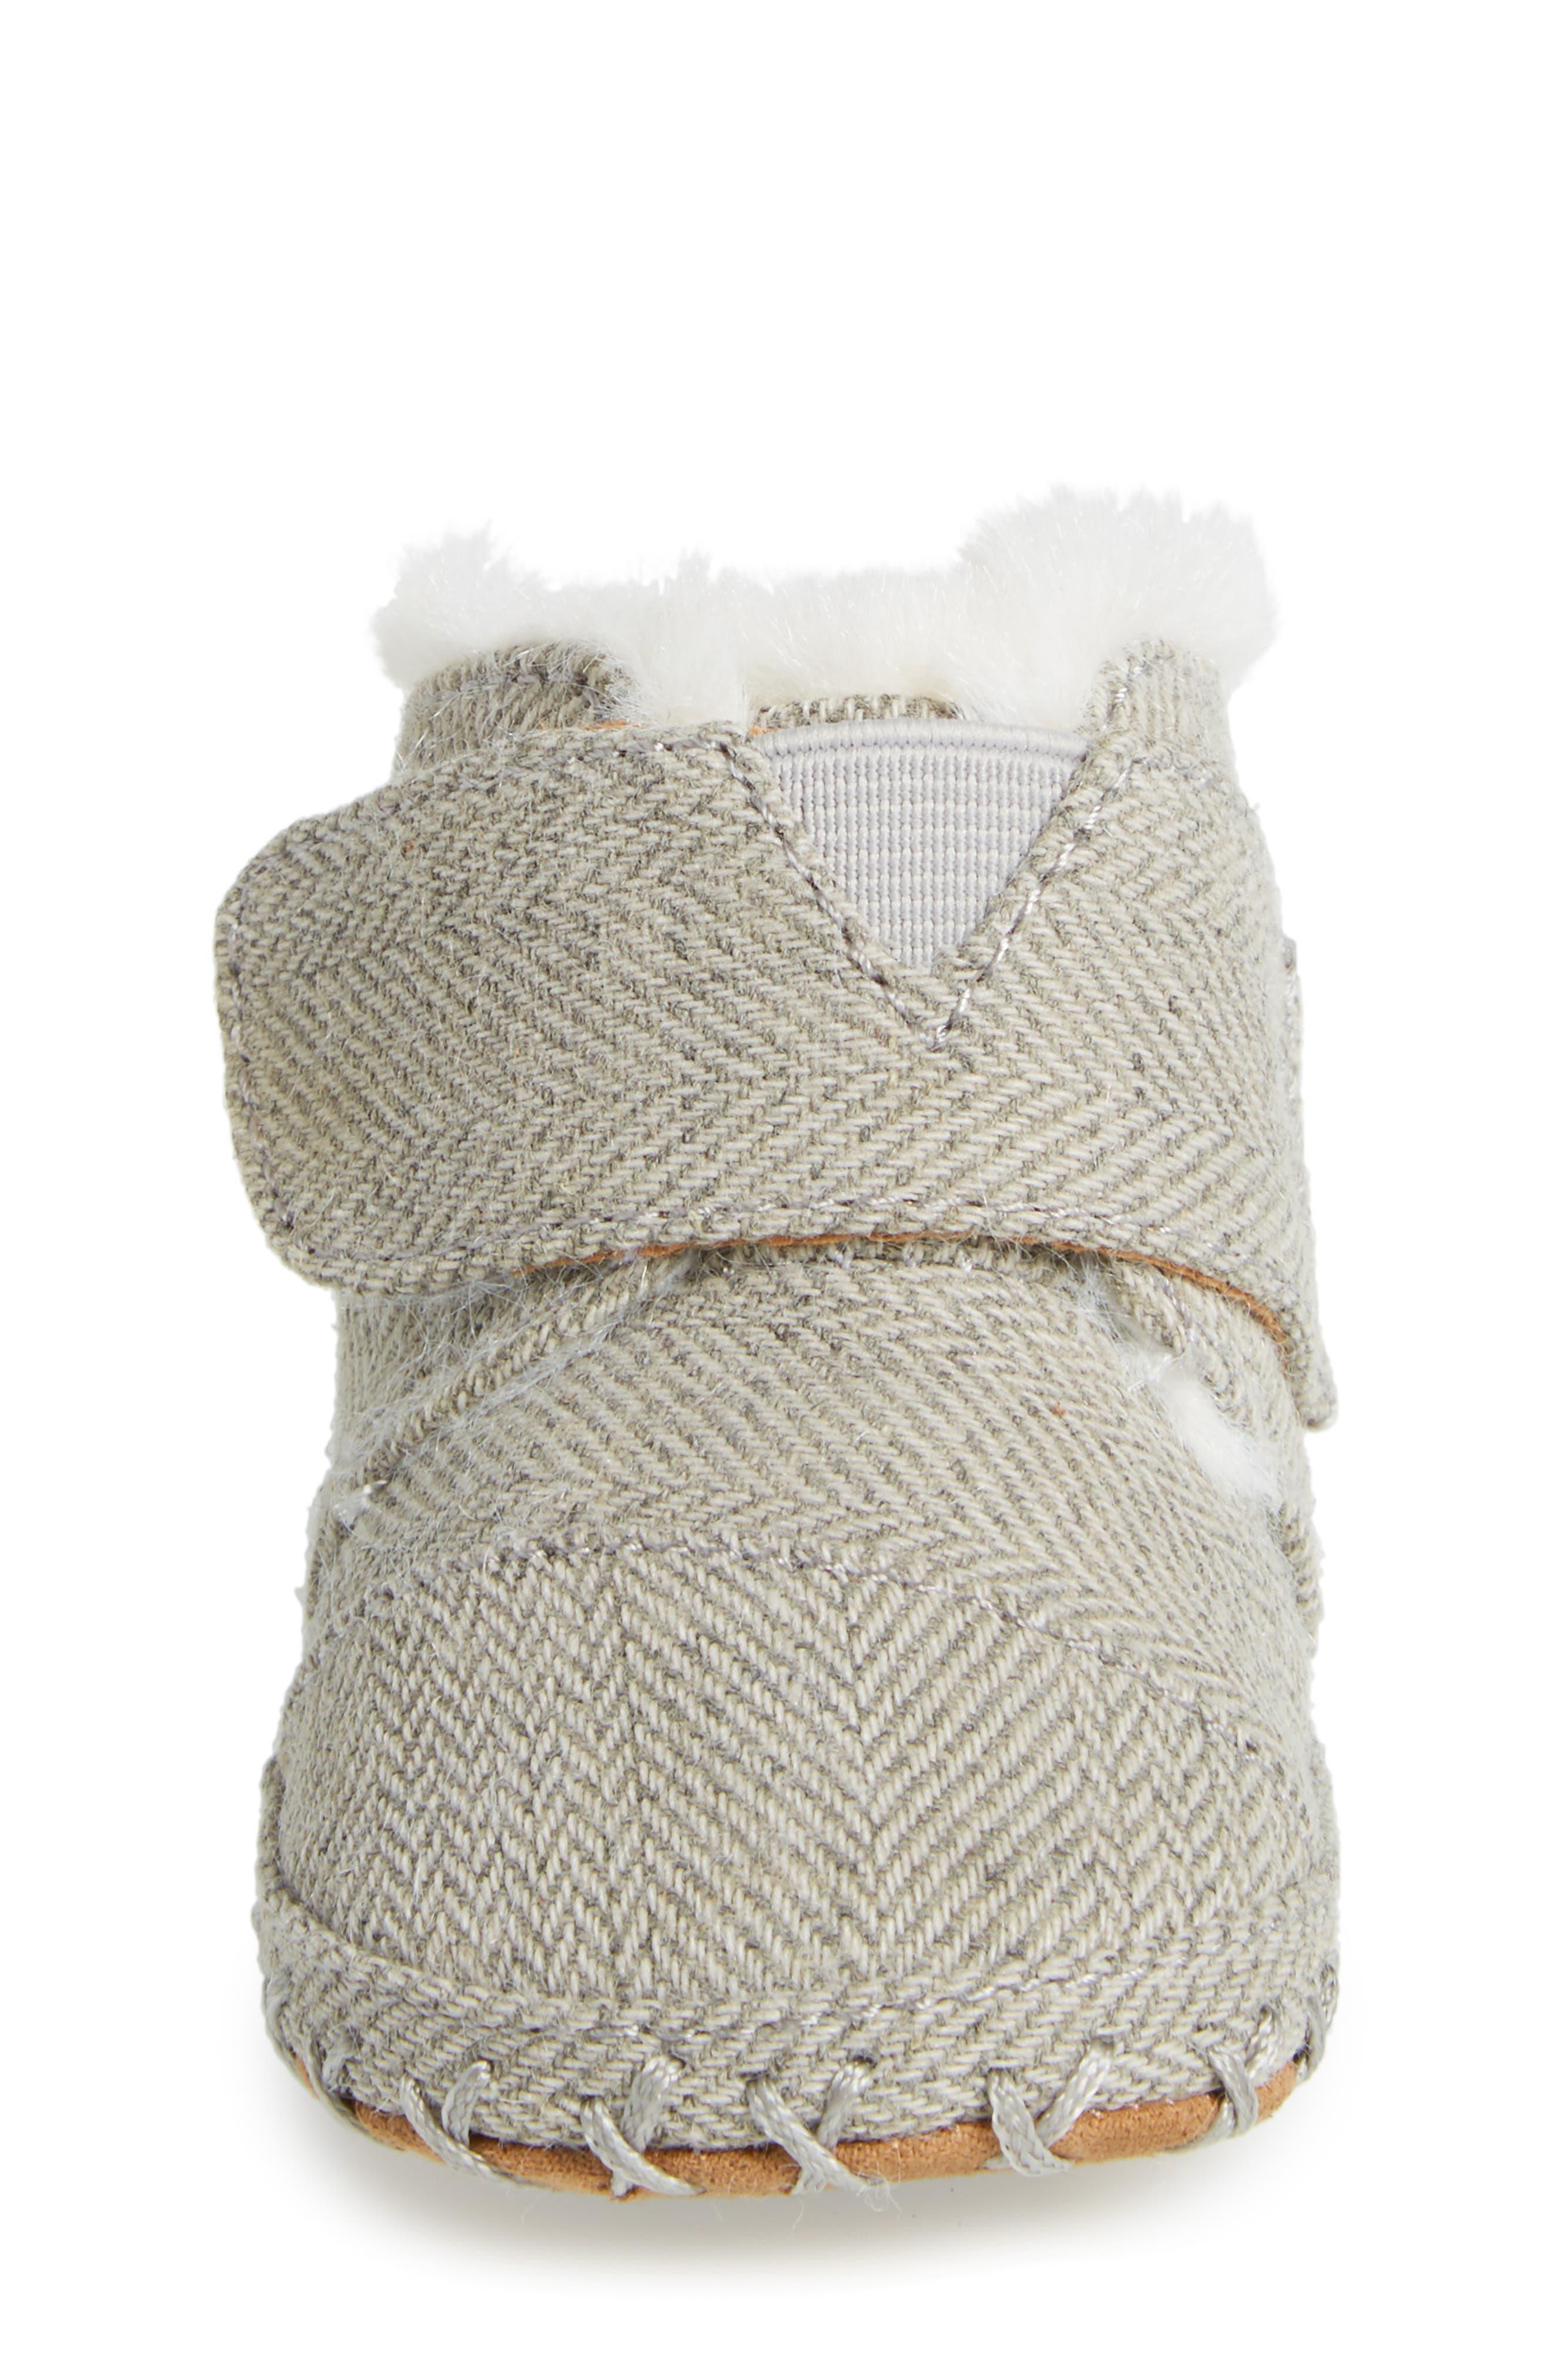 Tiny Cuna Faux Fur Crib Bootie,                             Alternate thumbnail 4, color,                             Drizzle Grey Herringbone